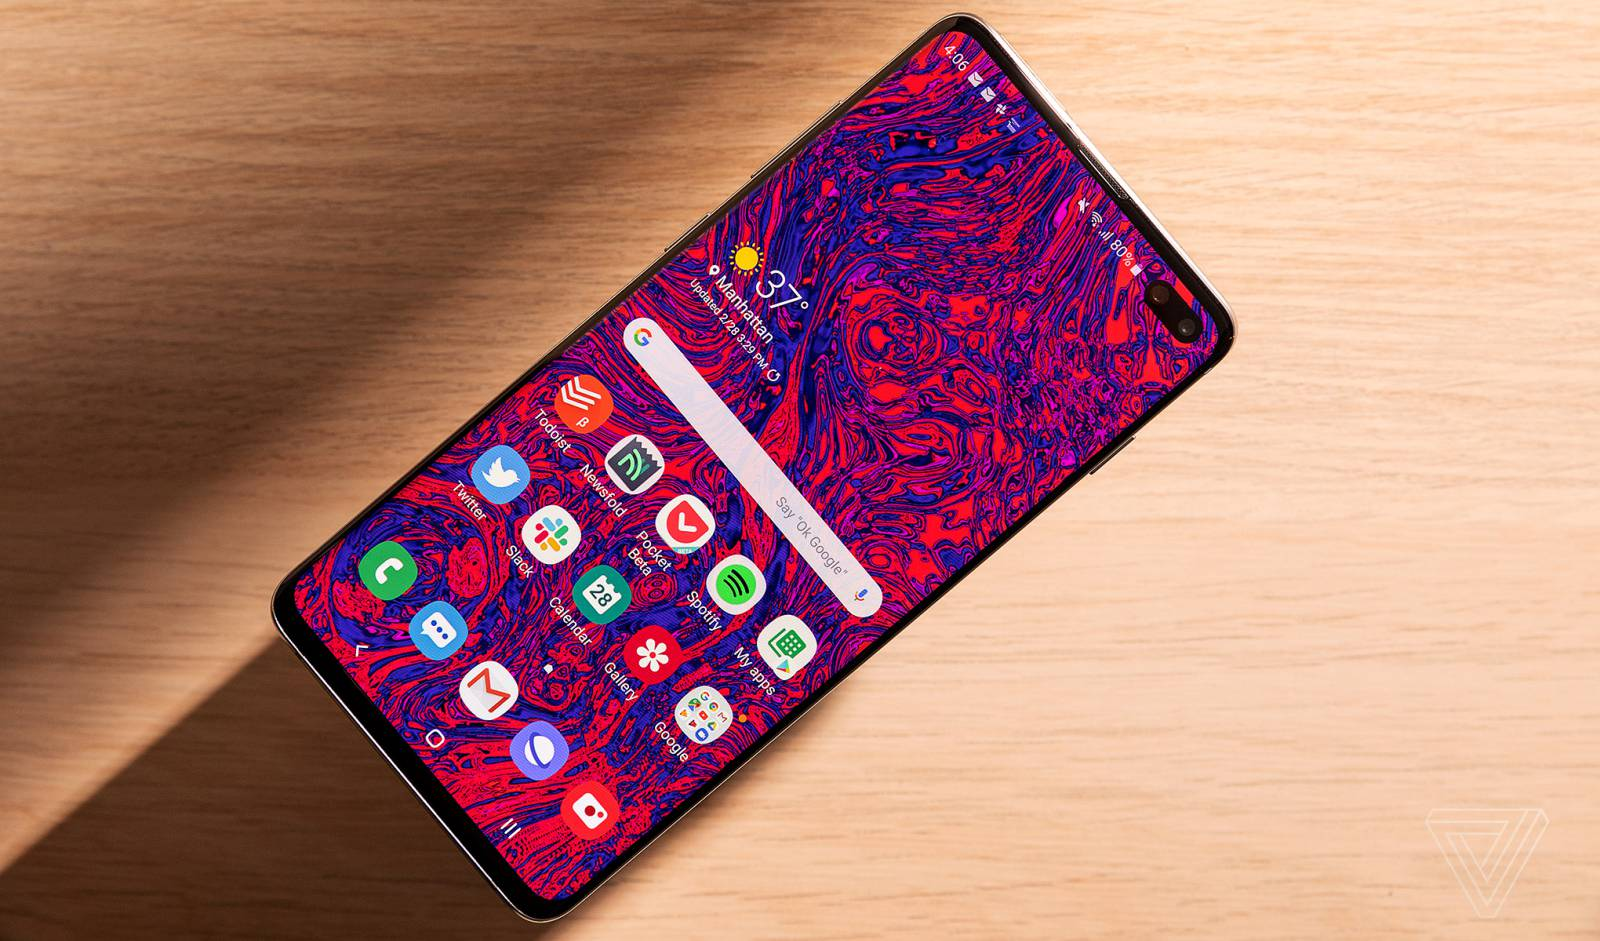 Samsung GALAXY S10 autonomie OnePlus 7 PRO